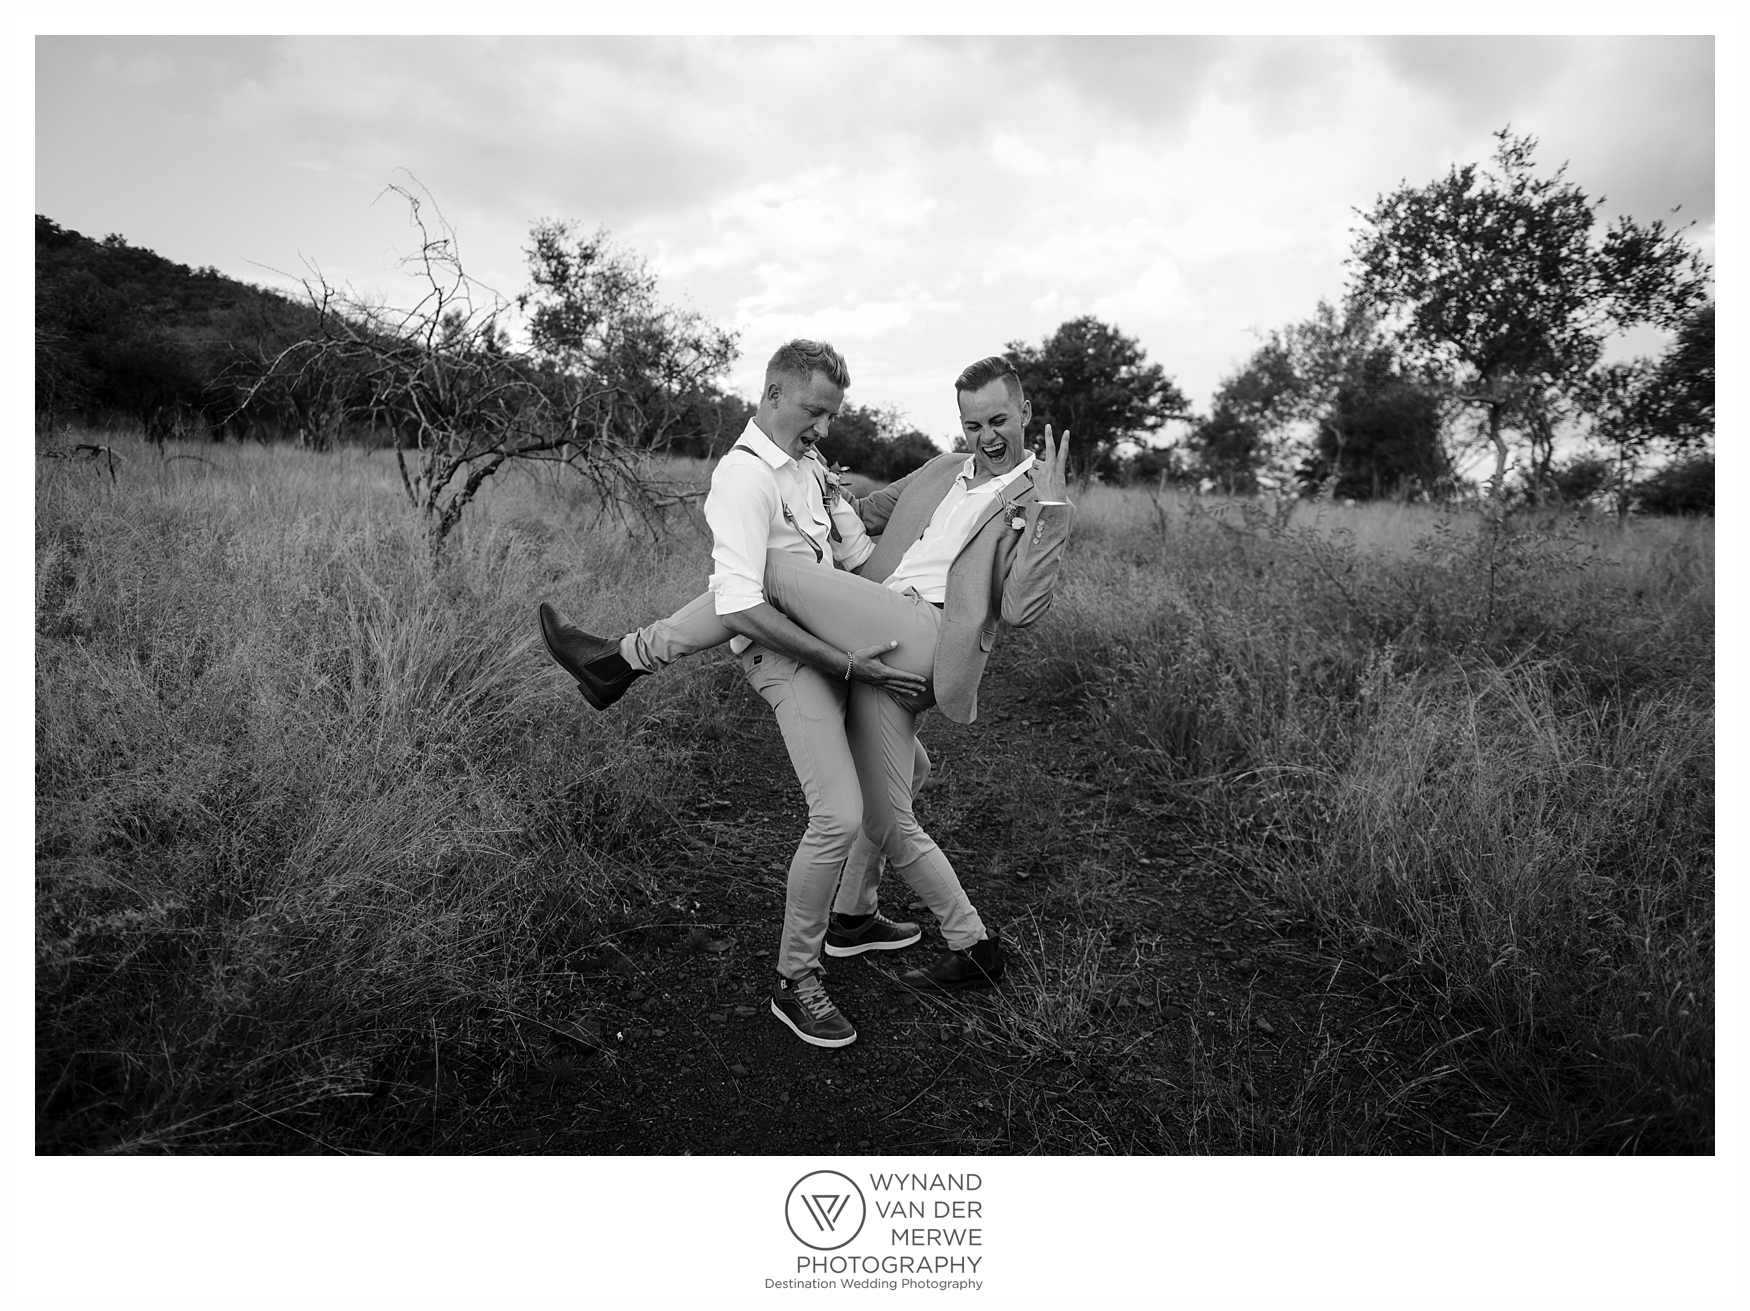 WynandvanderMerwe_weddingphotography_bushveldwedding_northam_bushveld_limpopowedding_limpopo_southafrica-205.jpg